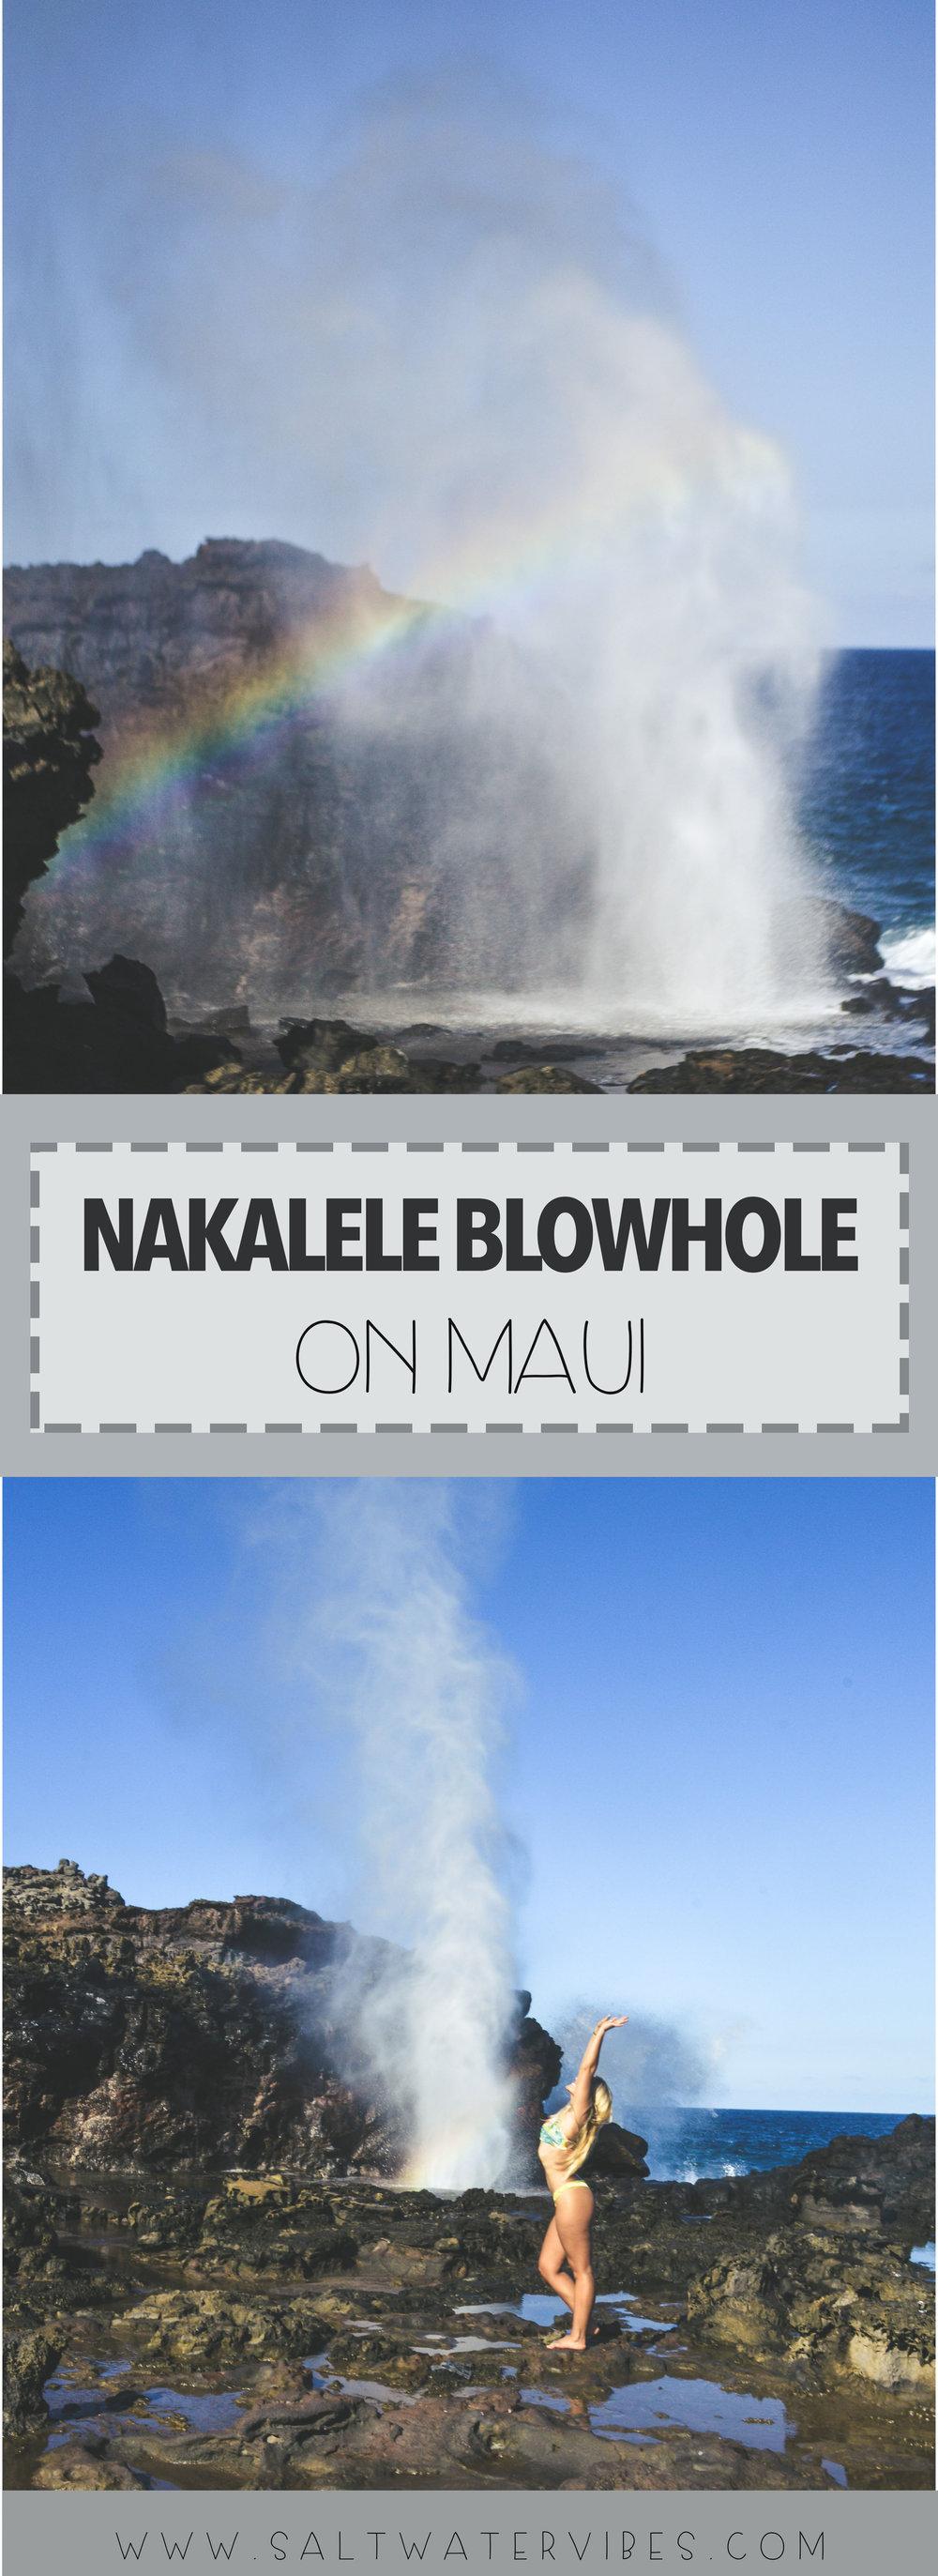 Nakalele Blowhole + SaltWaterVibes